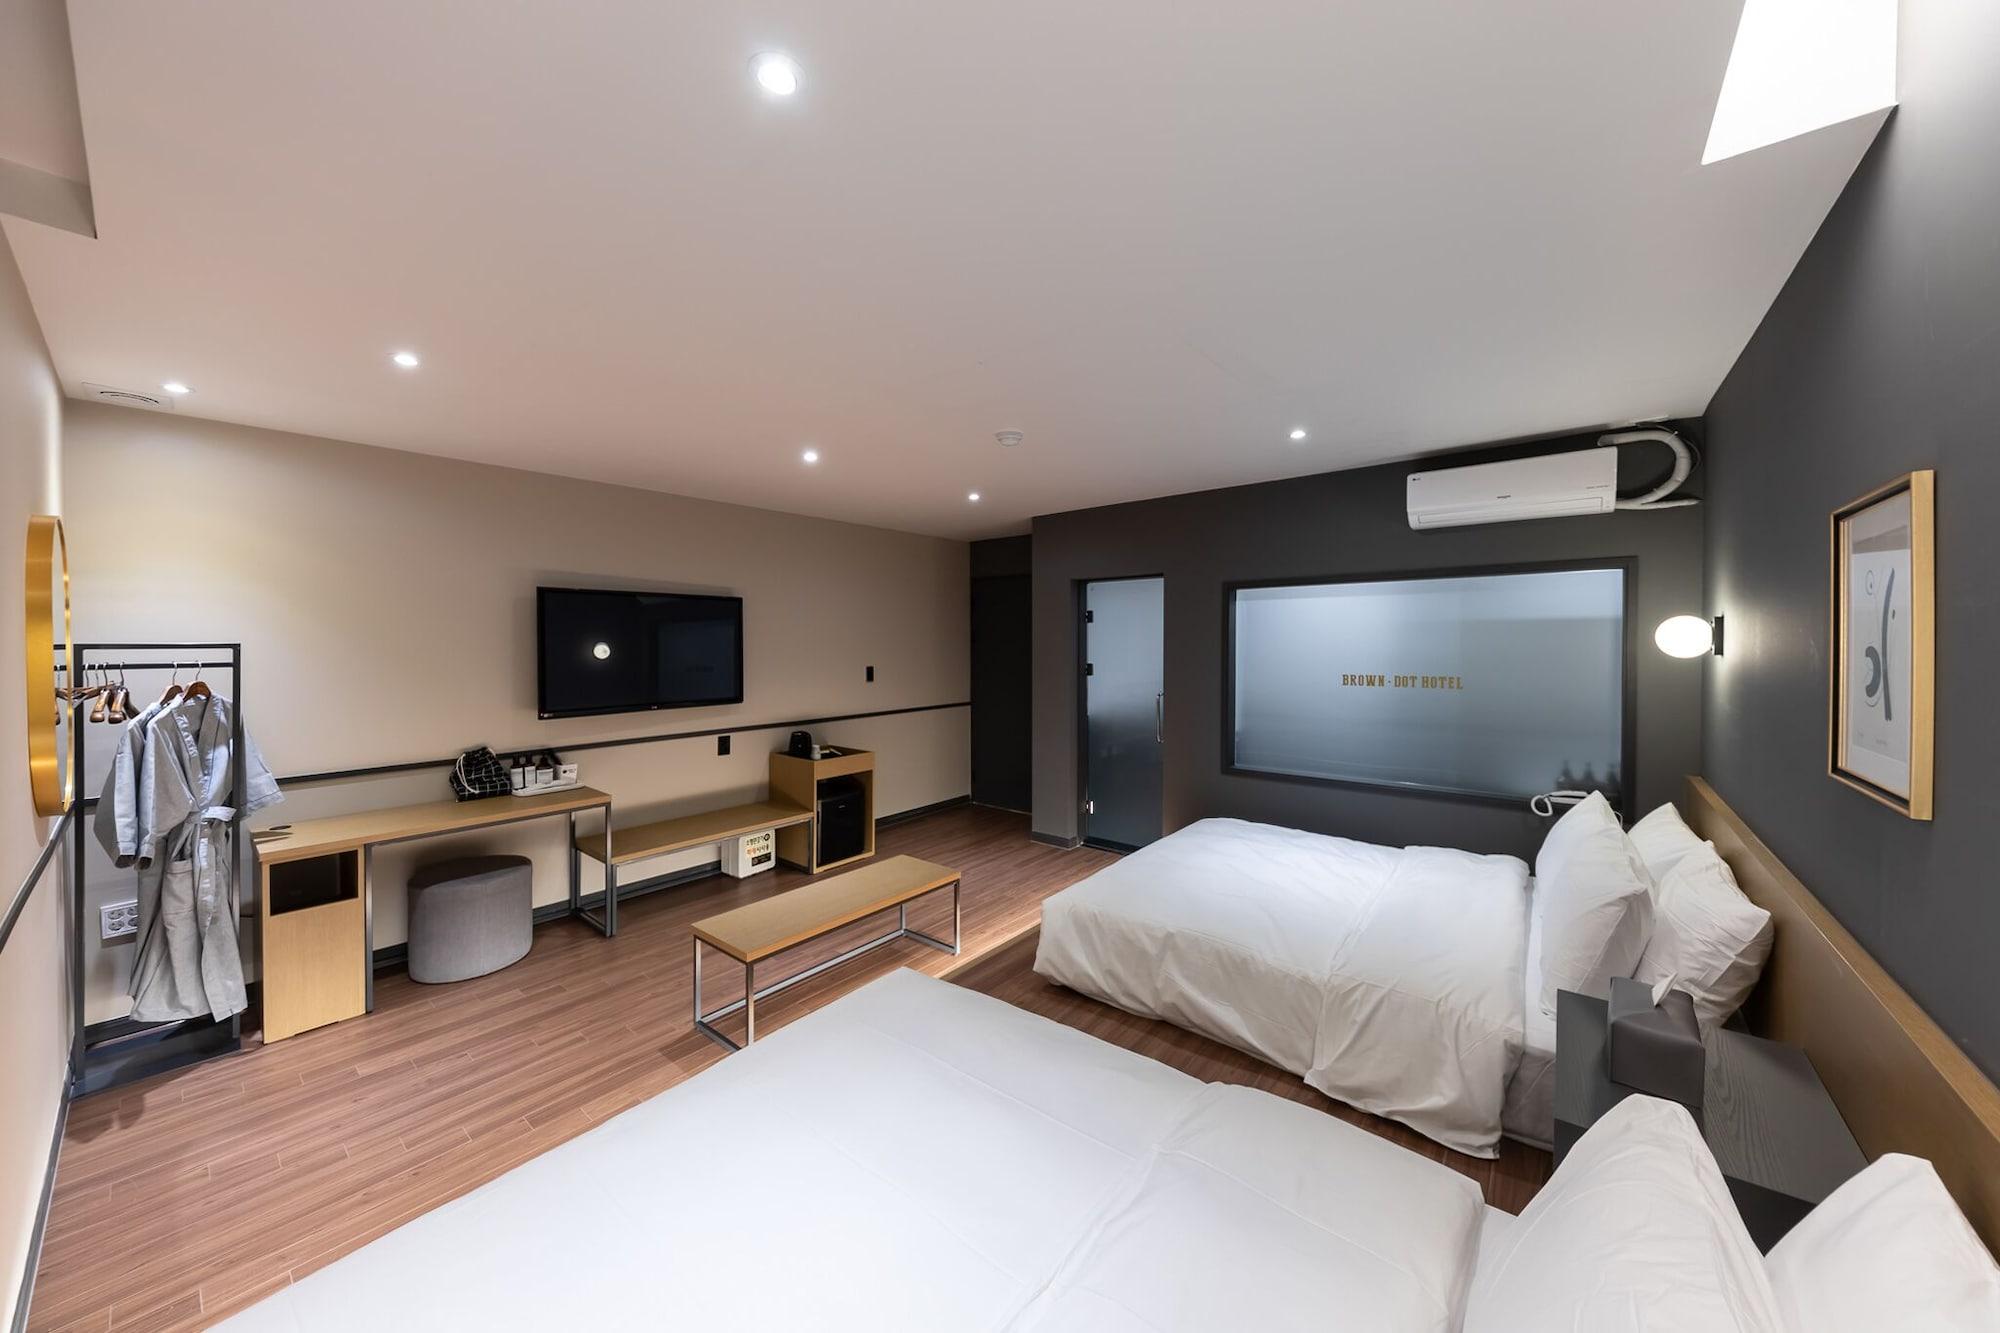 Browndot Hotel Daegu Seongseo, Dalseong